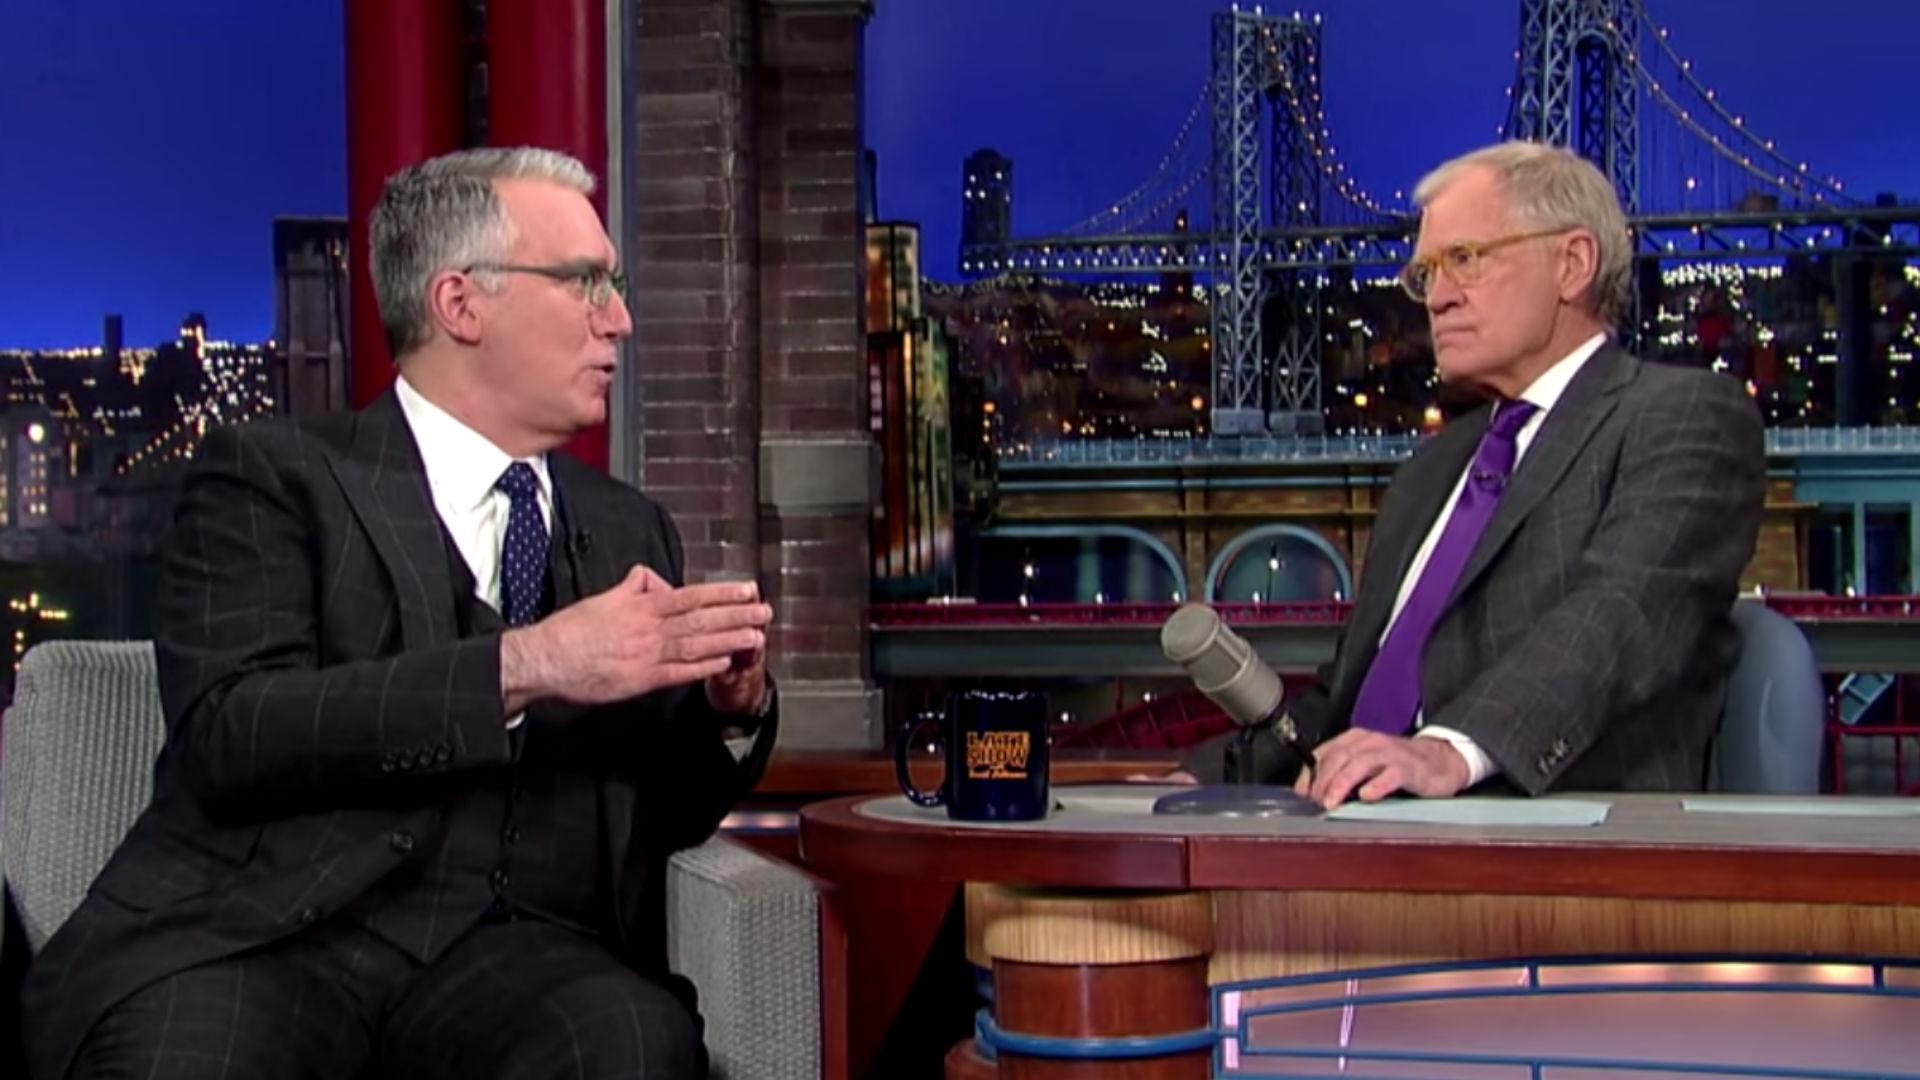 keith-olbermann-031115-FTR-YouTube.jpg